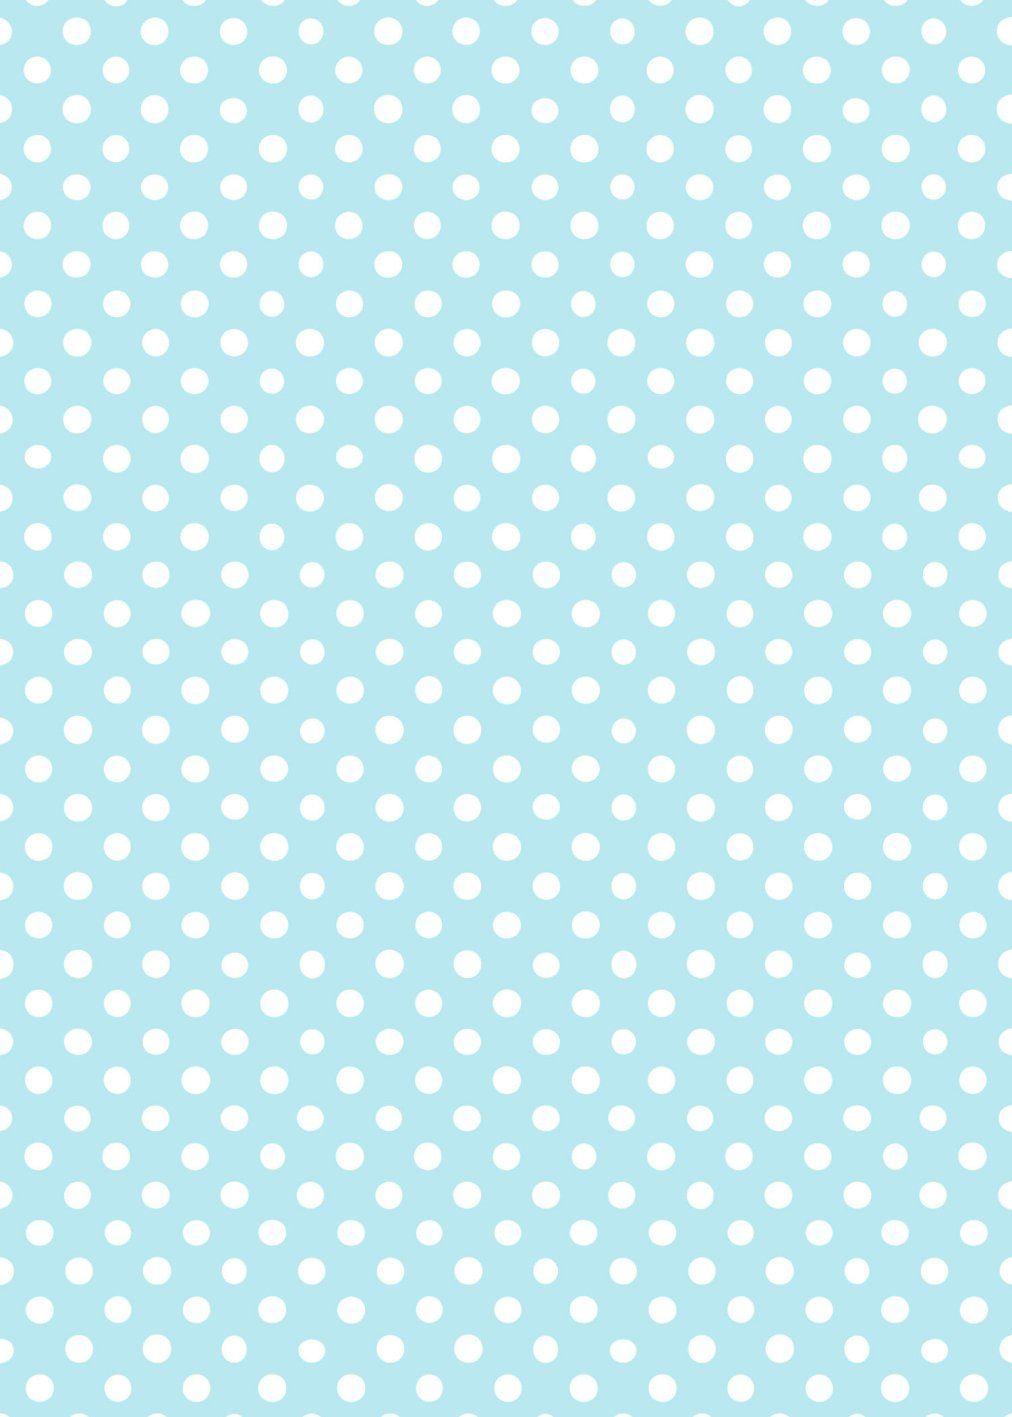 Wallpaper Cute Pink For Iphone 6 Morandi Sisters Microworld Printable Wallpapers Polka